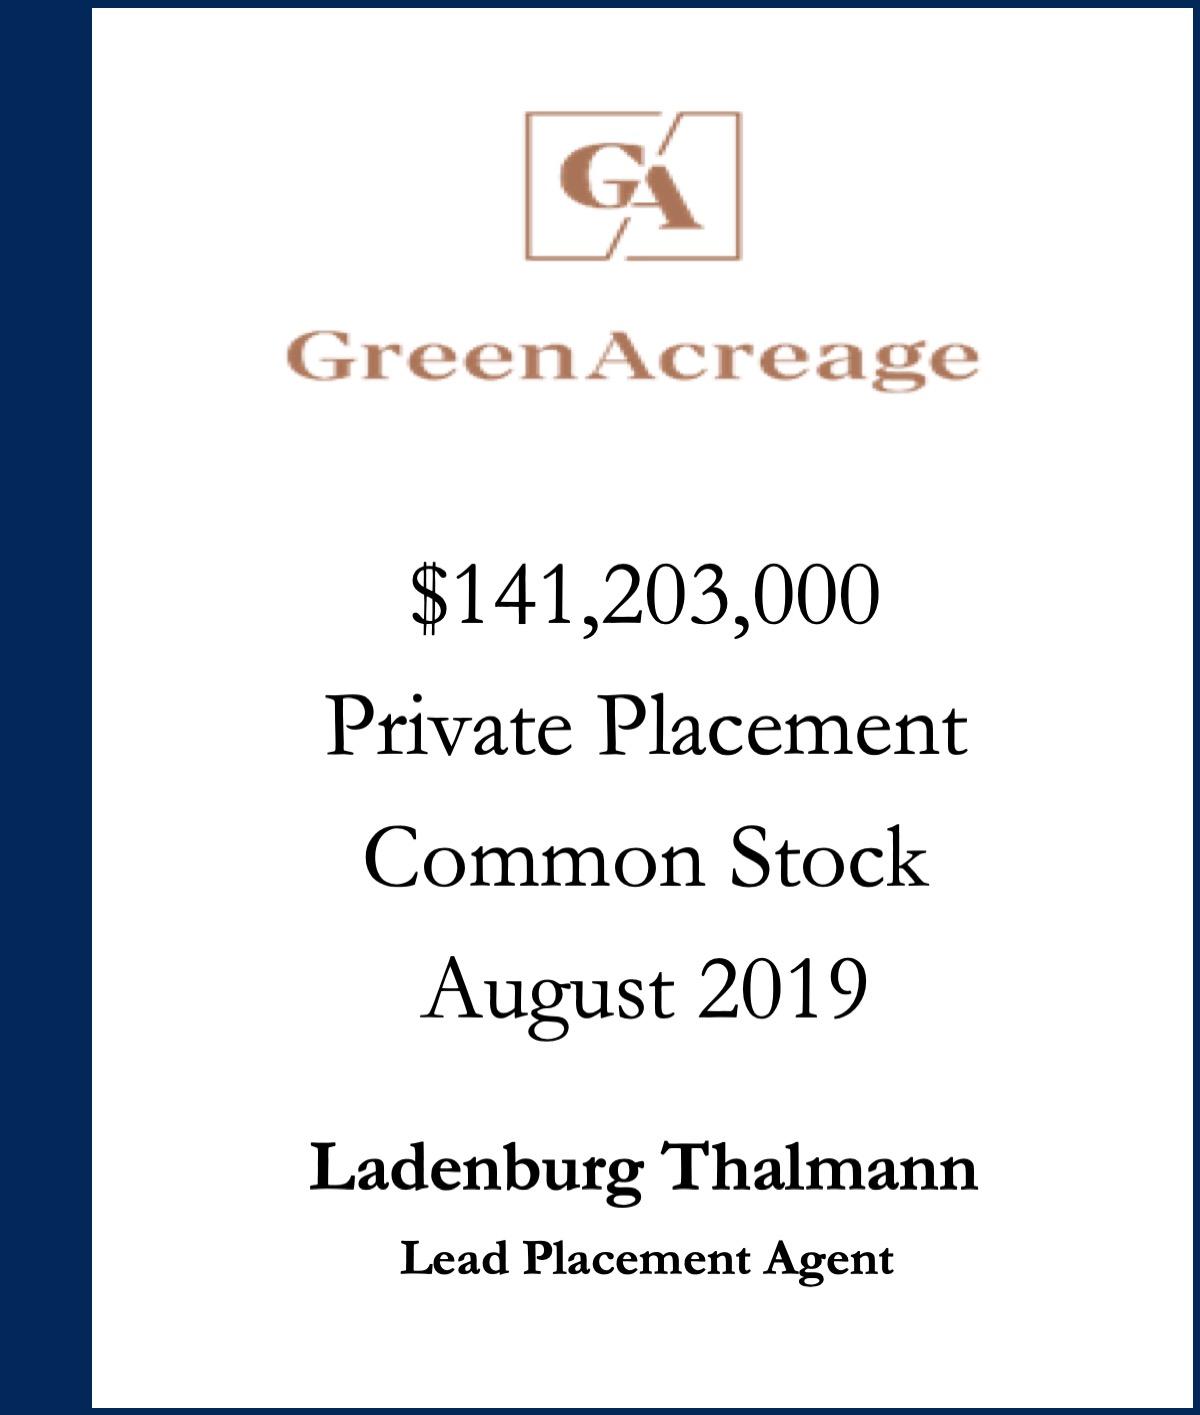 Green Acreage